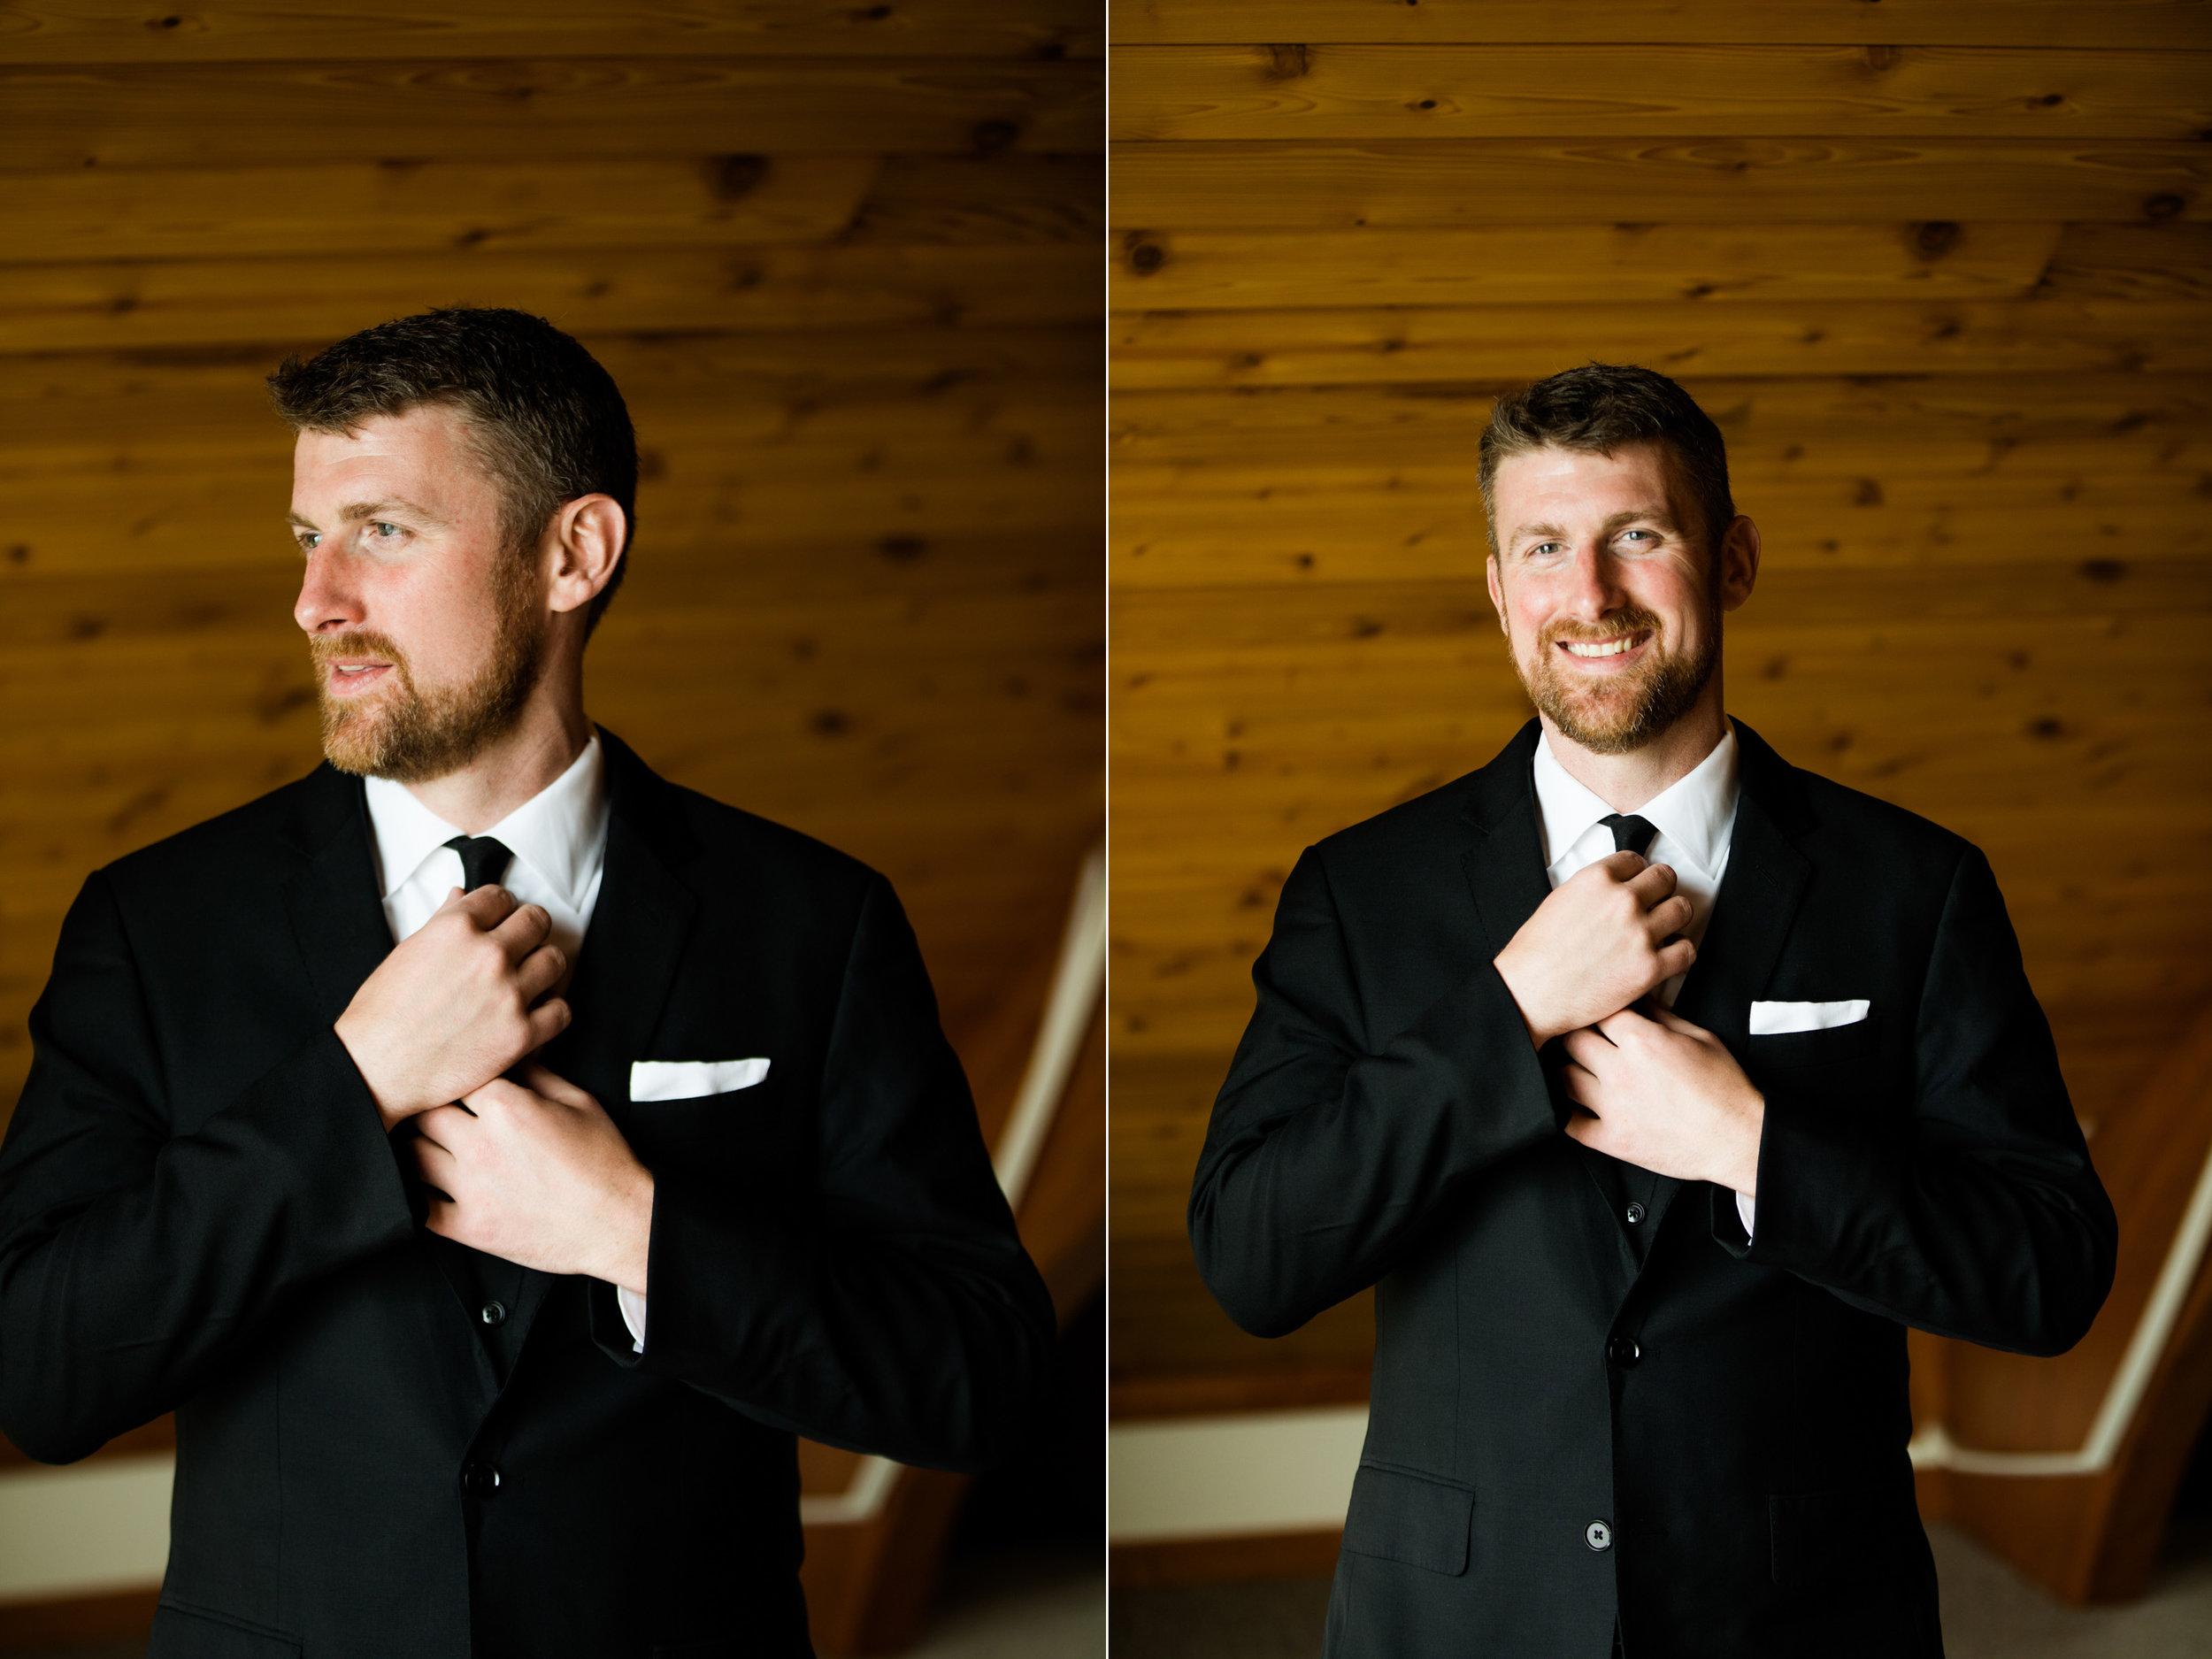 maine-wedding-photographer-machias -1c.jpg